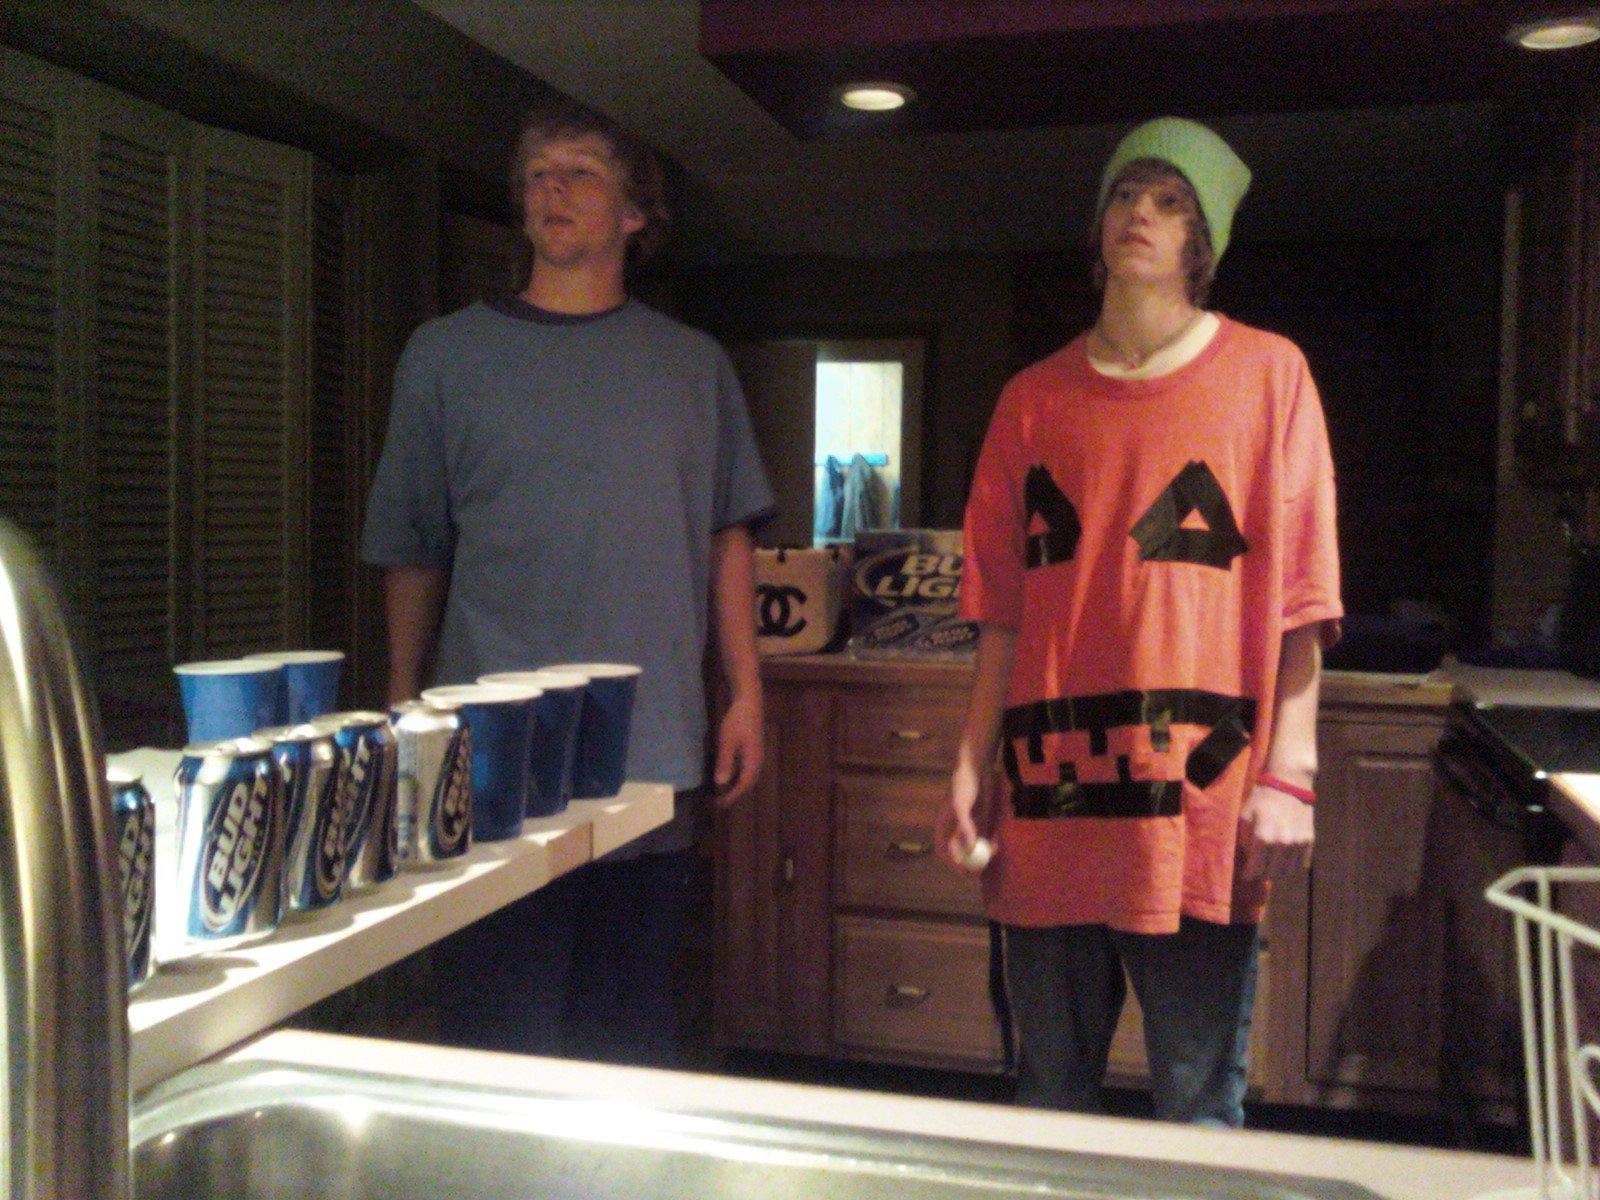 My awesome halloween costume